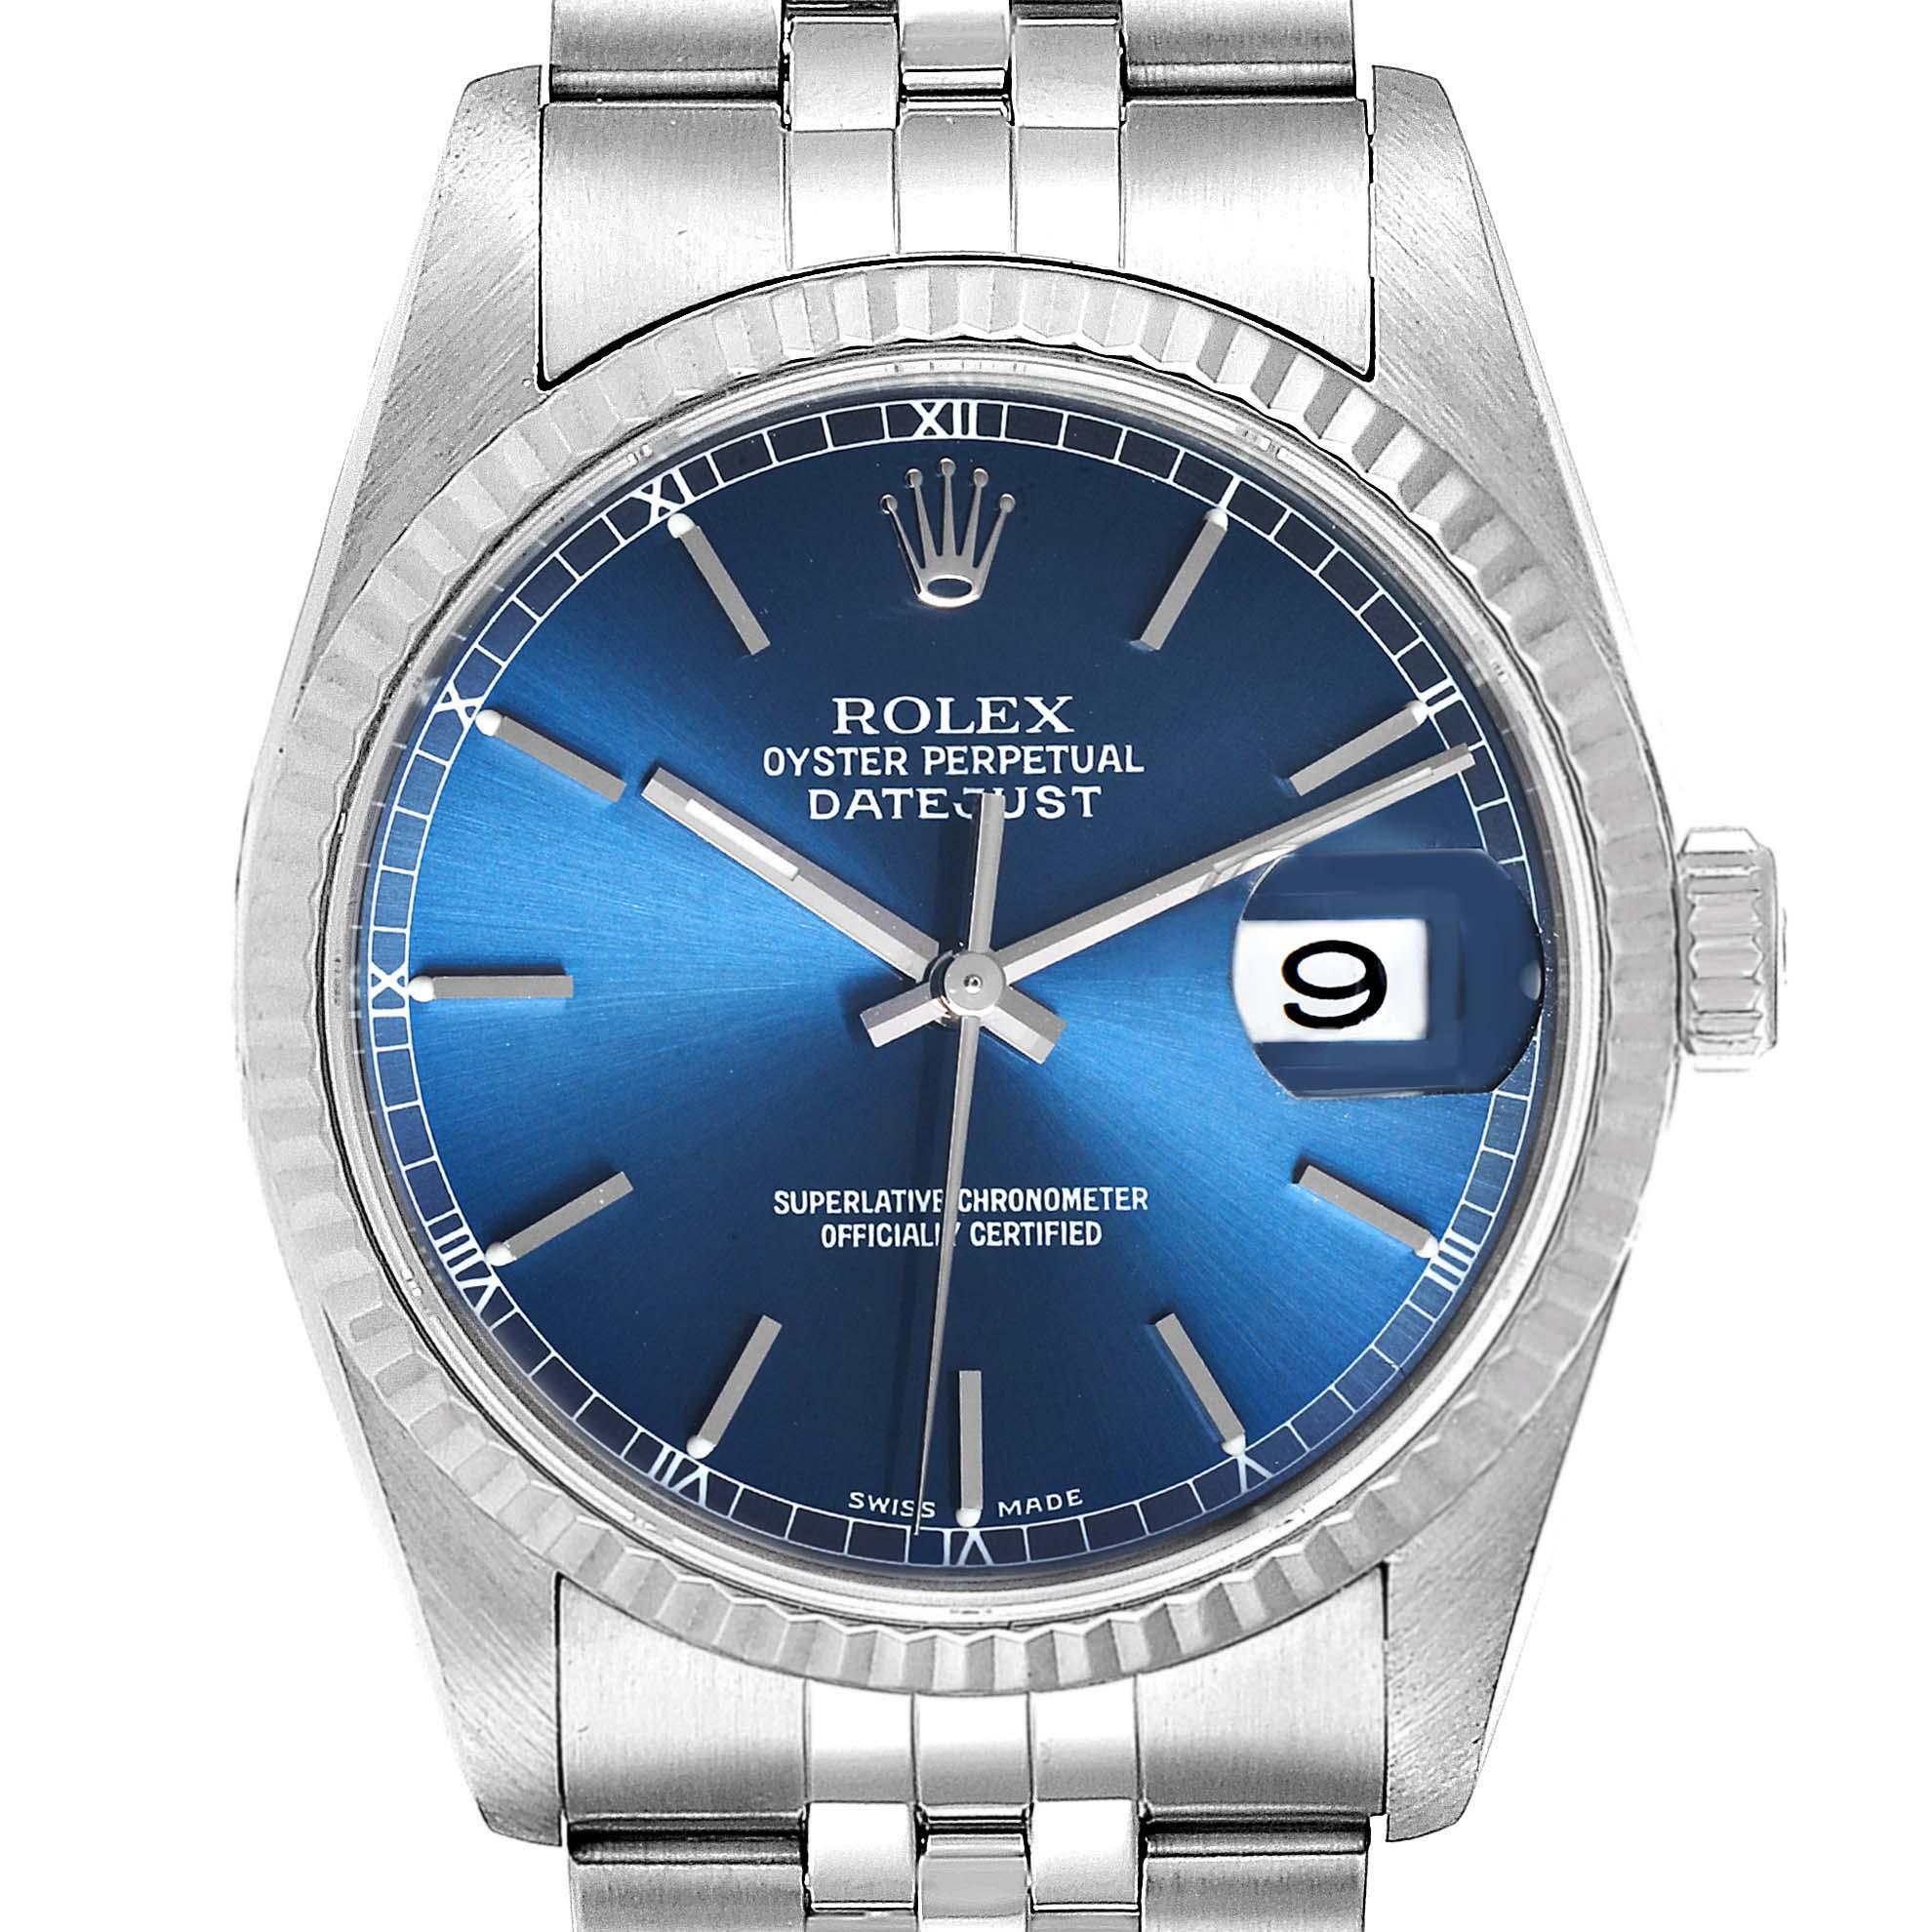 Rolex Datejust Steel White Gold Blue Dial Fluted Bezel Mens Watch 16234